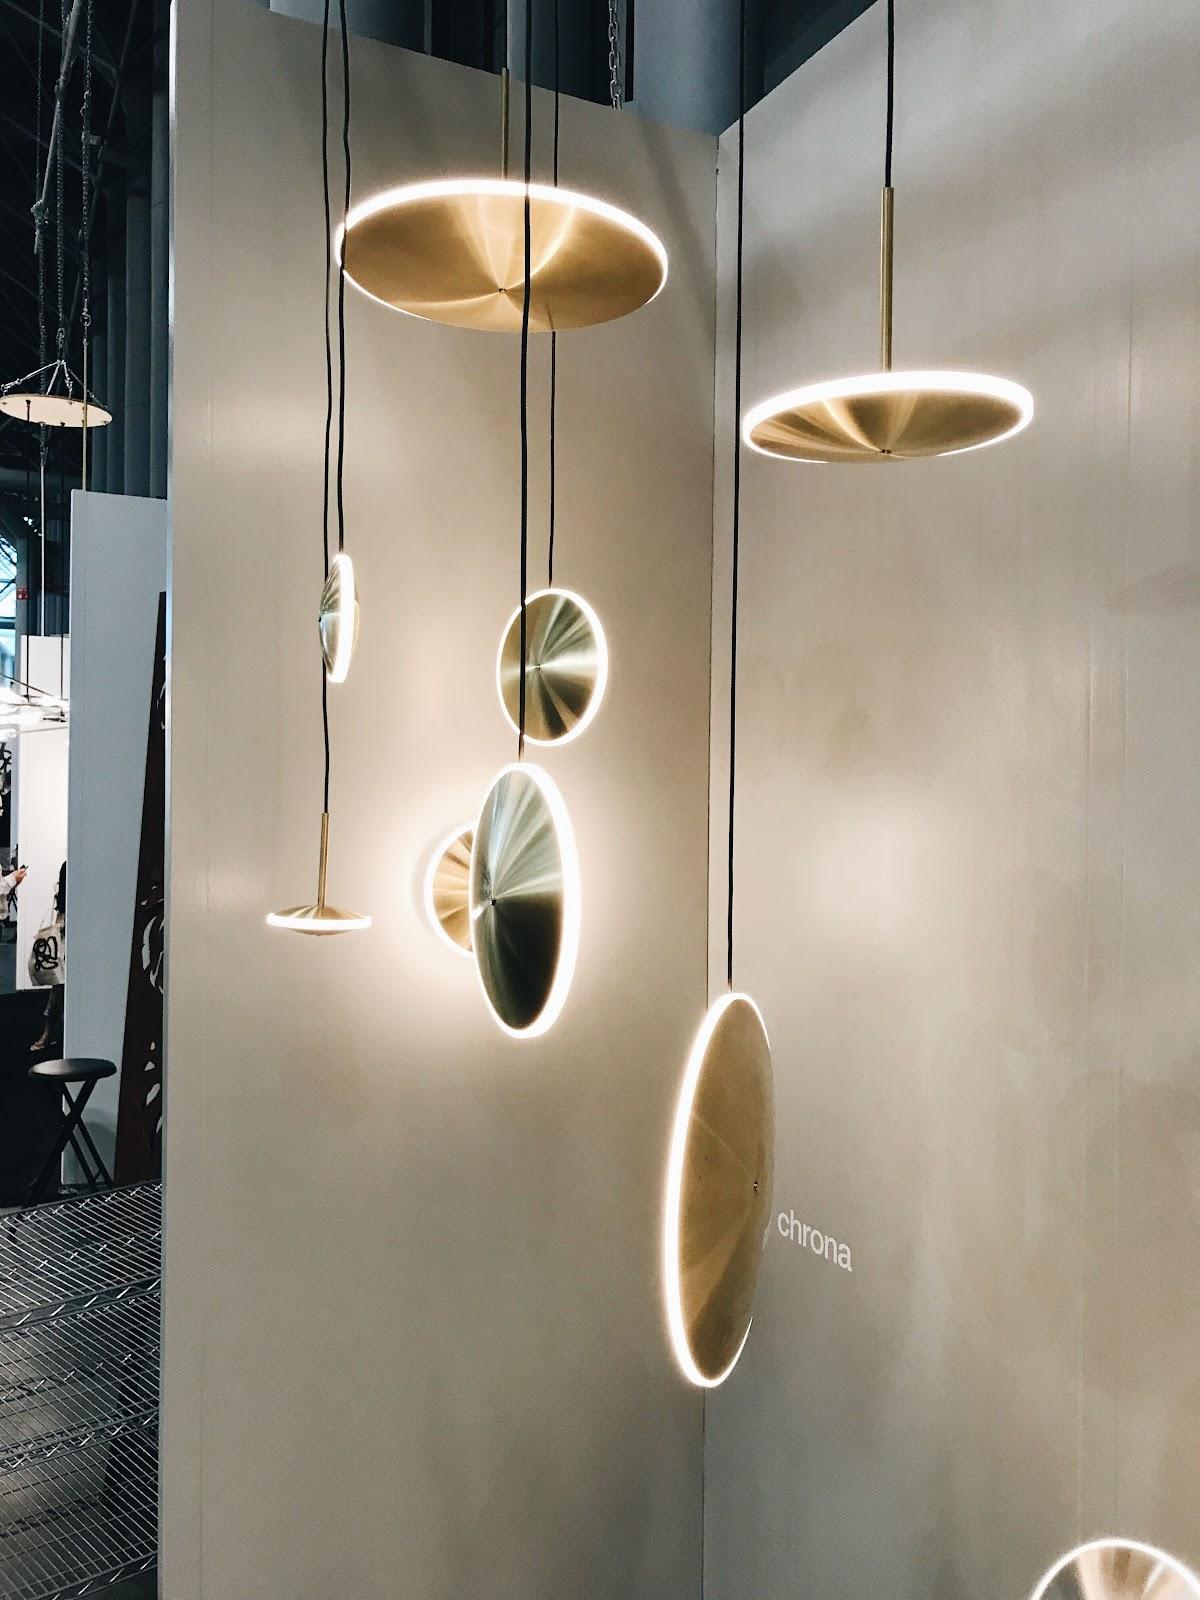 ICFF international contemporary design furniture fair disk pendants